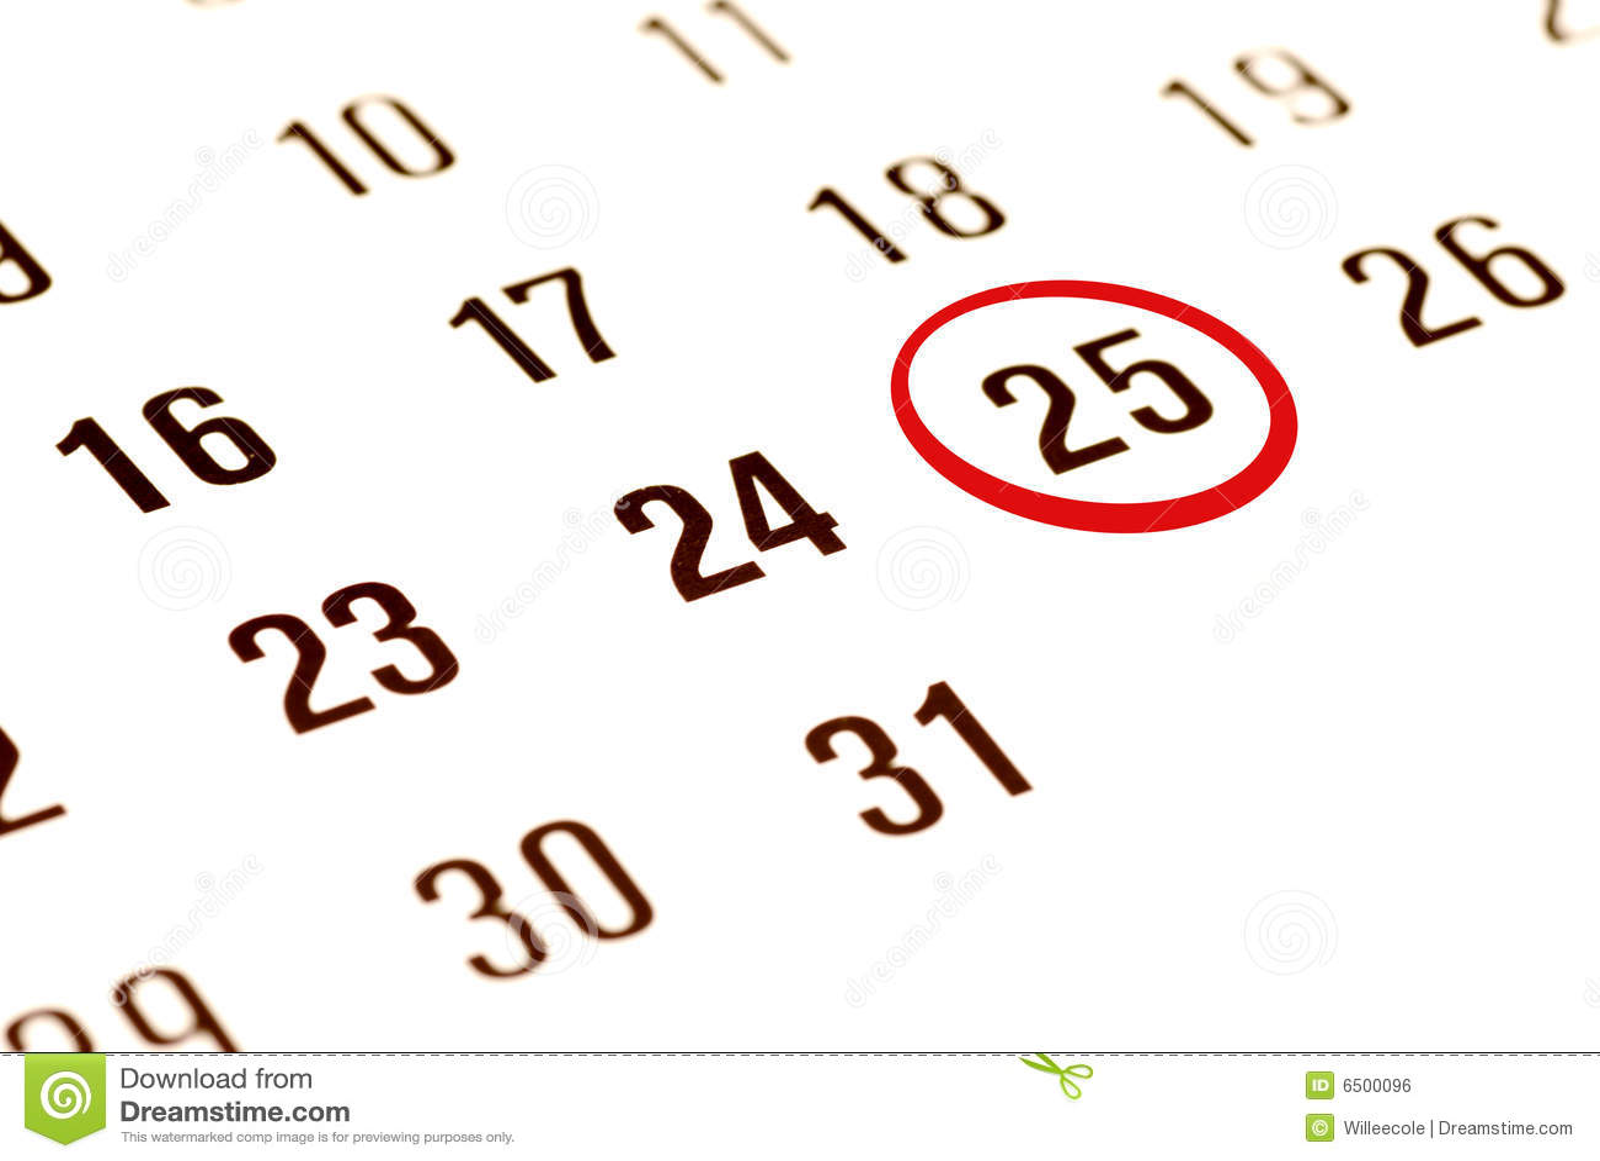 christmas day on calendar royalty free stock image image